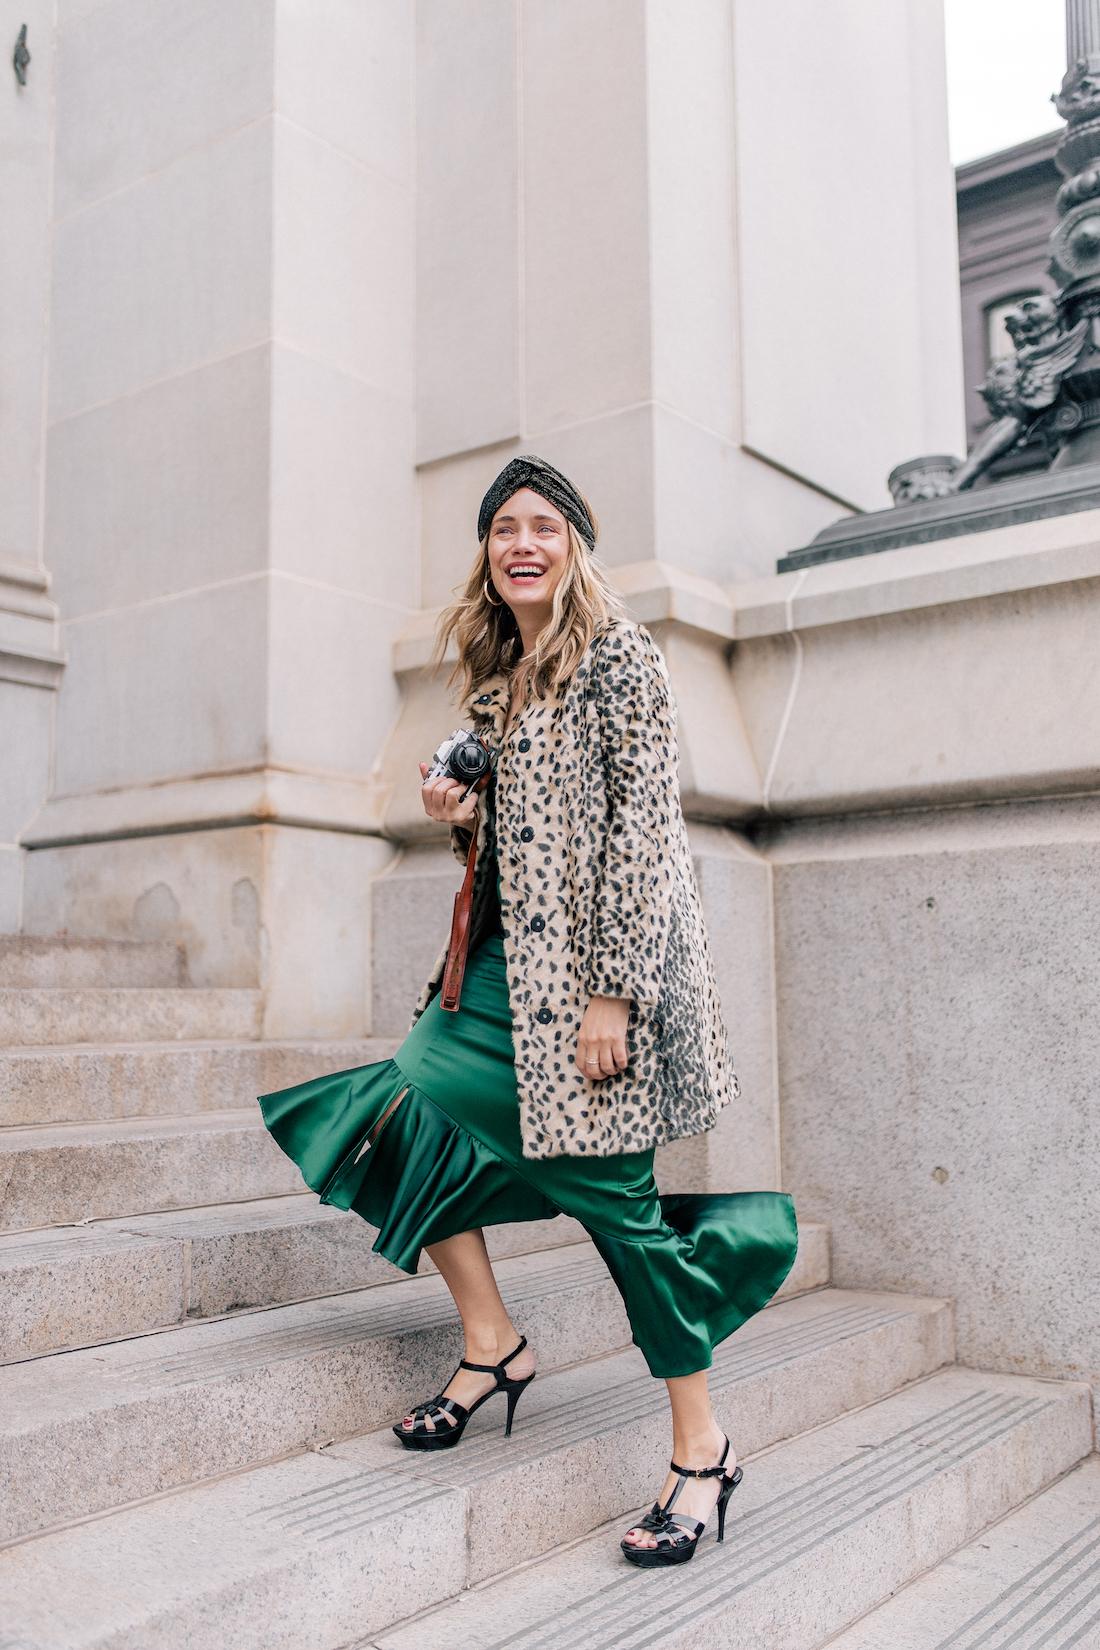 Outfit Details: Viva Aviva Dress c/o// Animal Print Coat // Zara Sparkly Headband! // Saint Laurent Tribute Sandals // Okhtein Bag